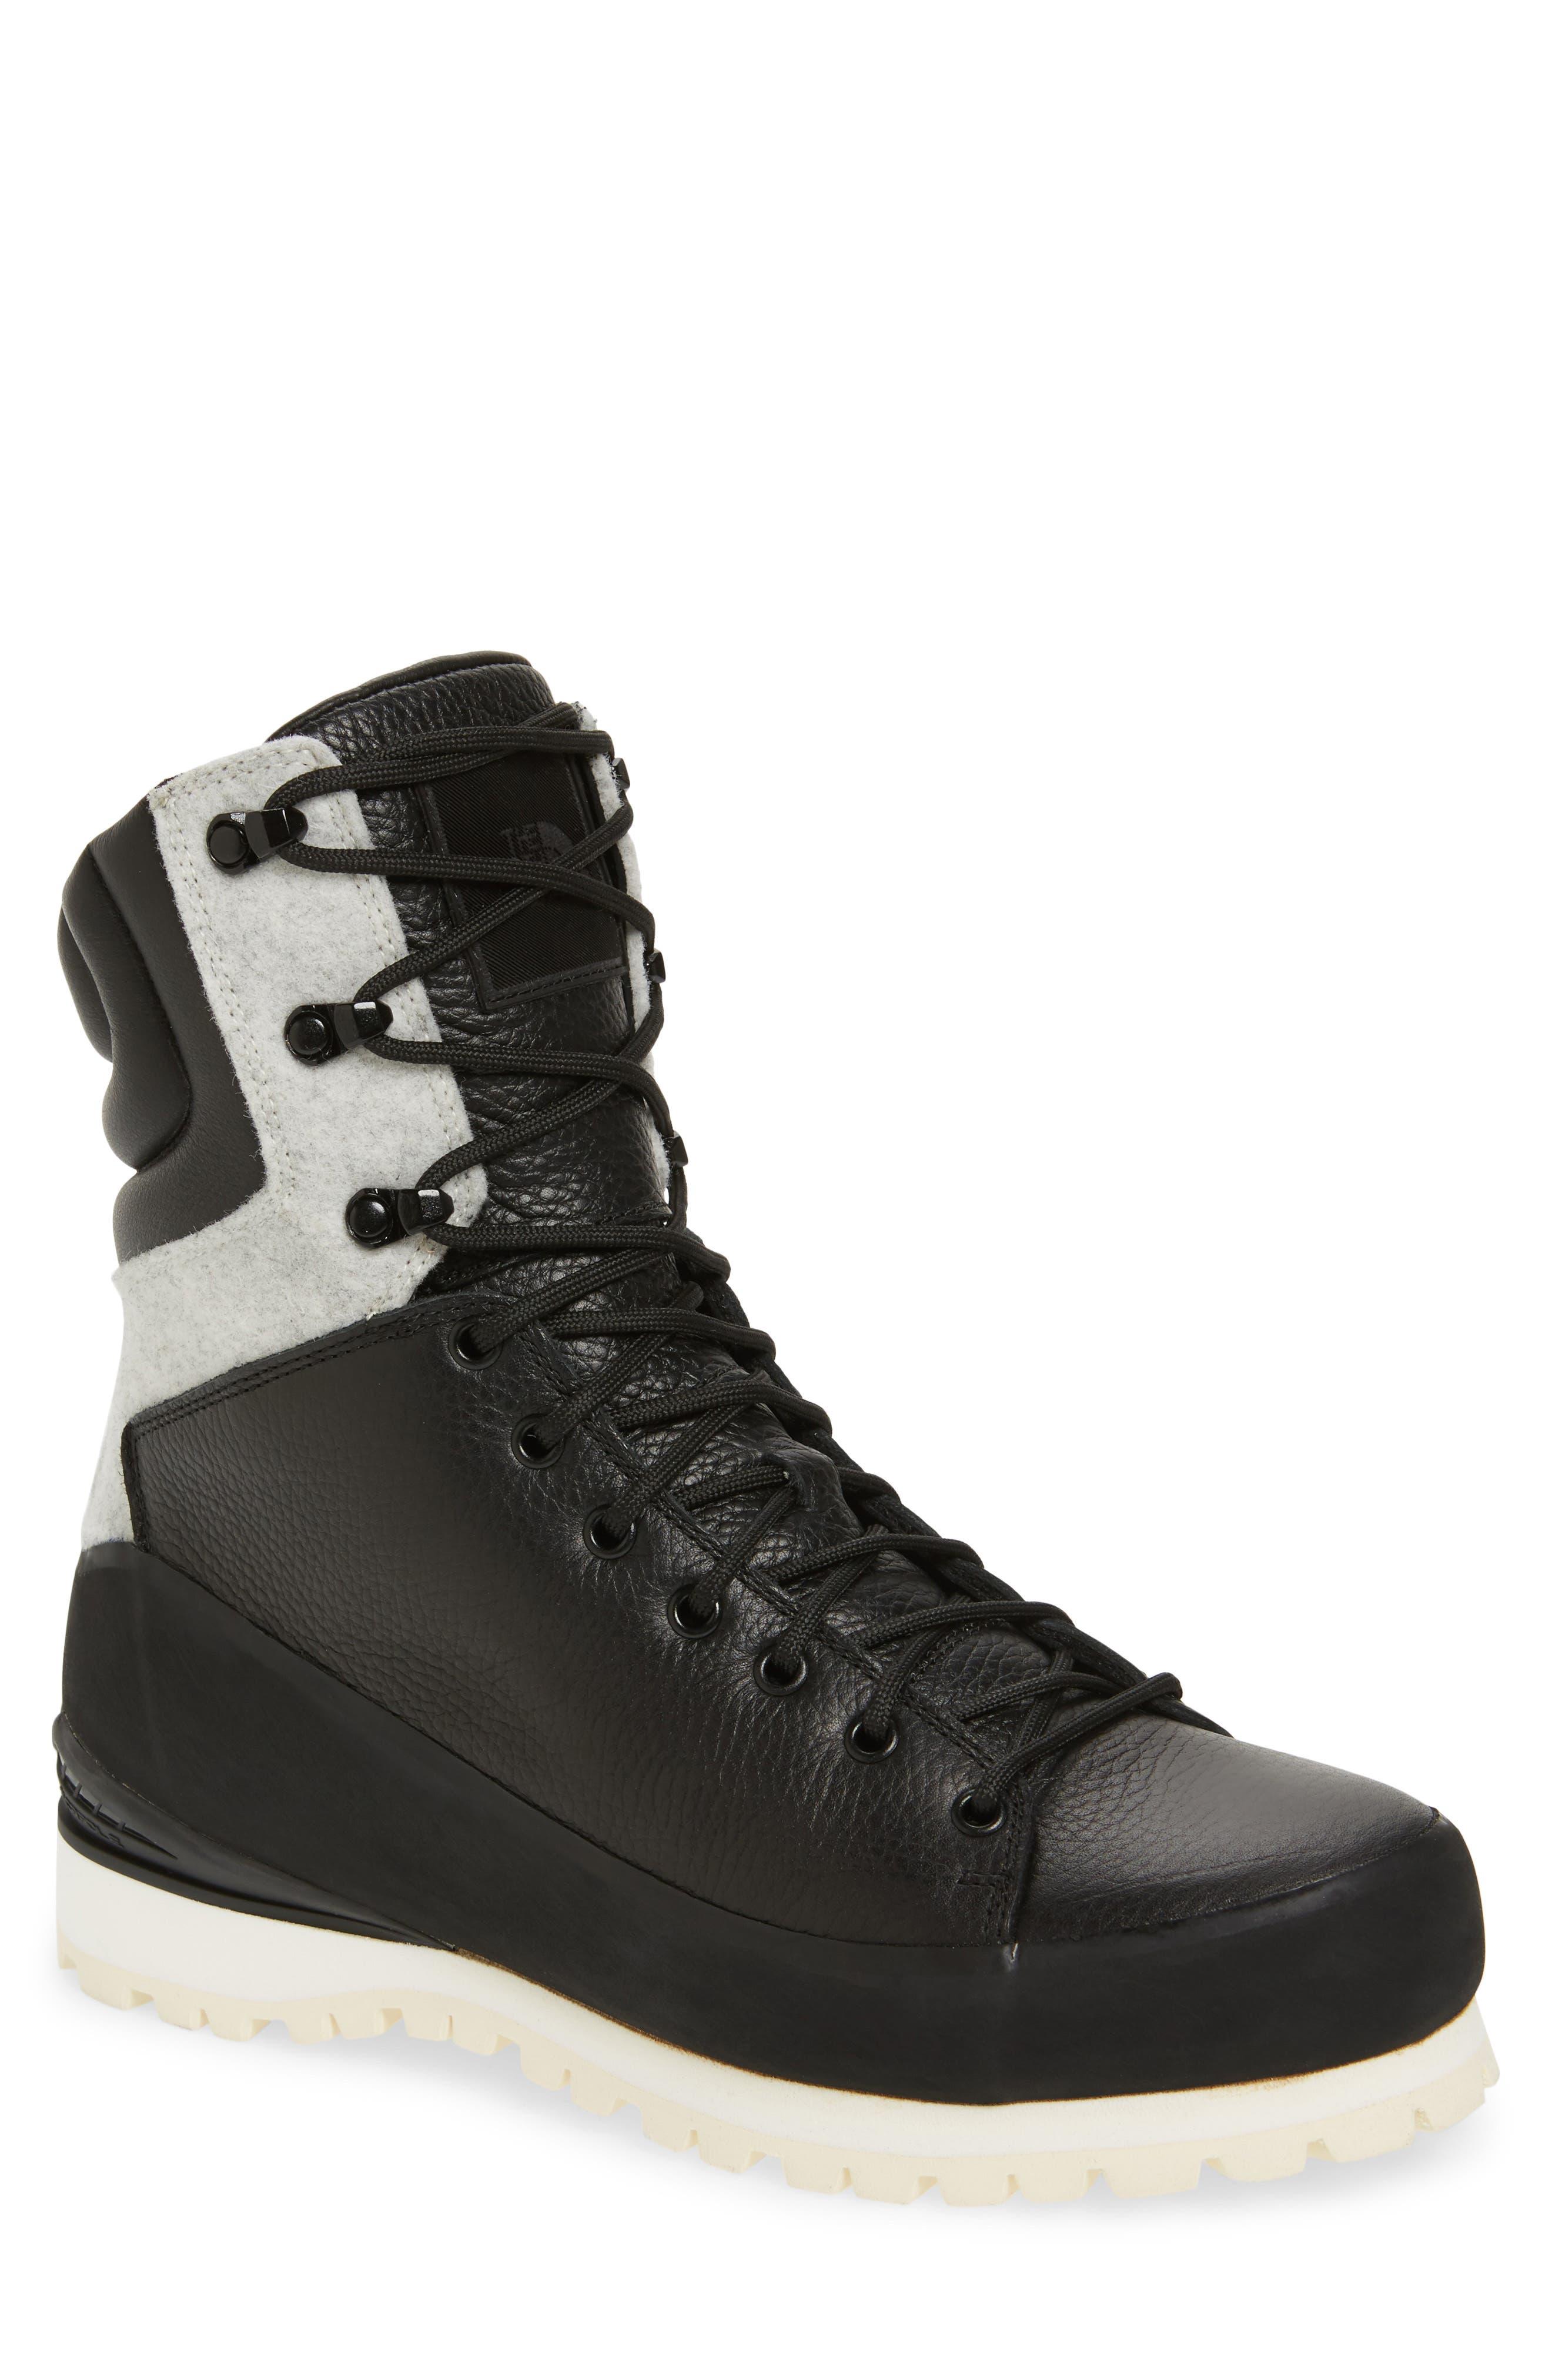 Cryos Boot,                         Main,                         color, TNF BLACK/ GLACIER WHITE